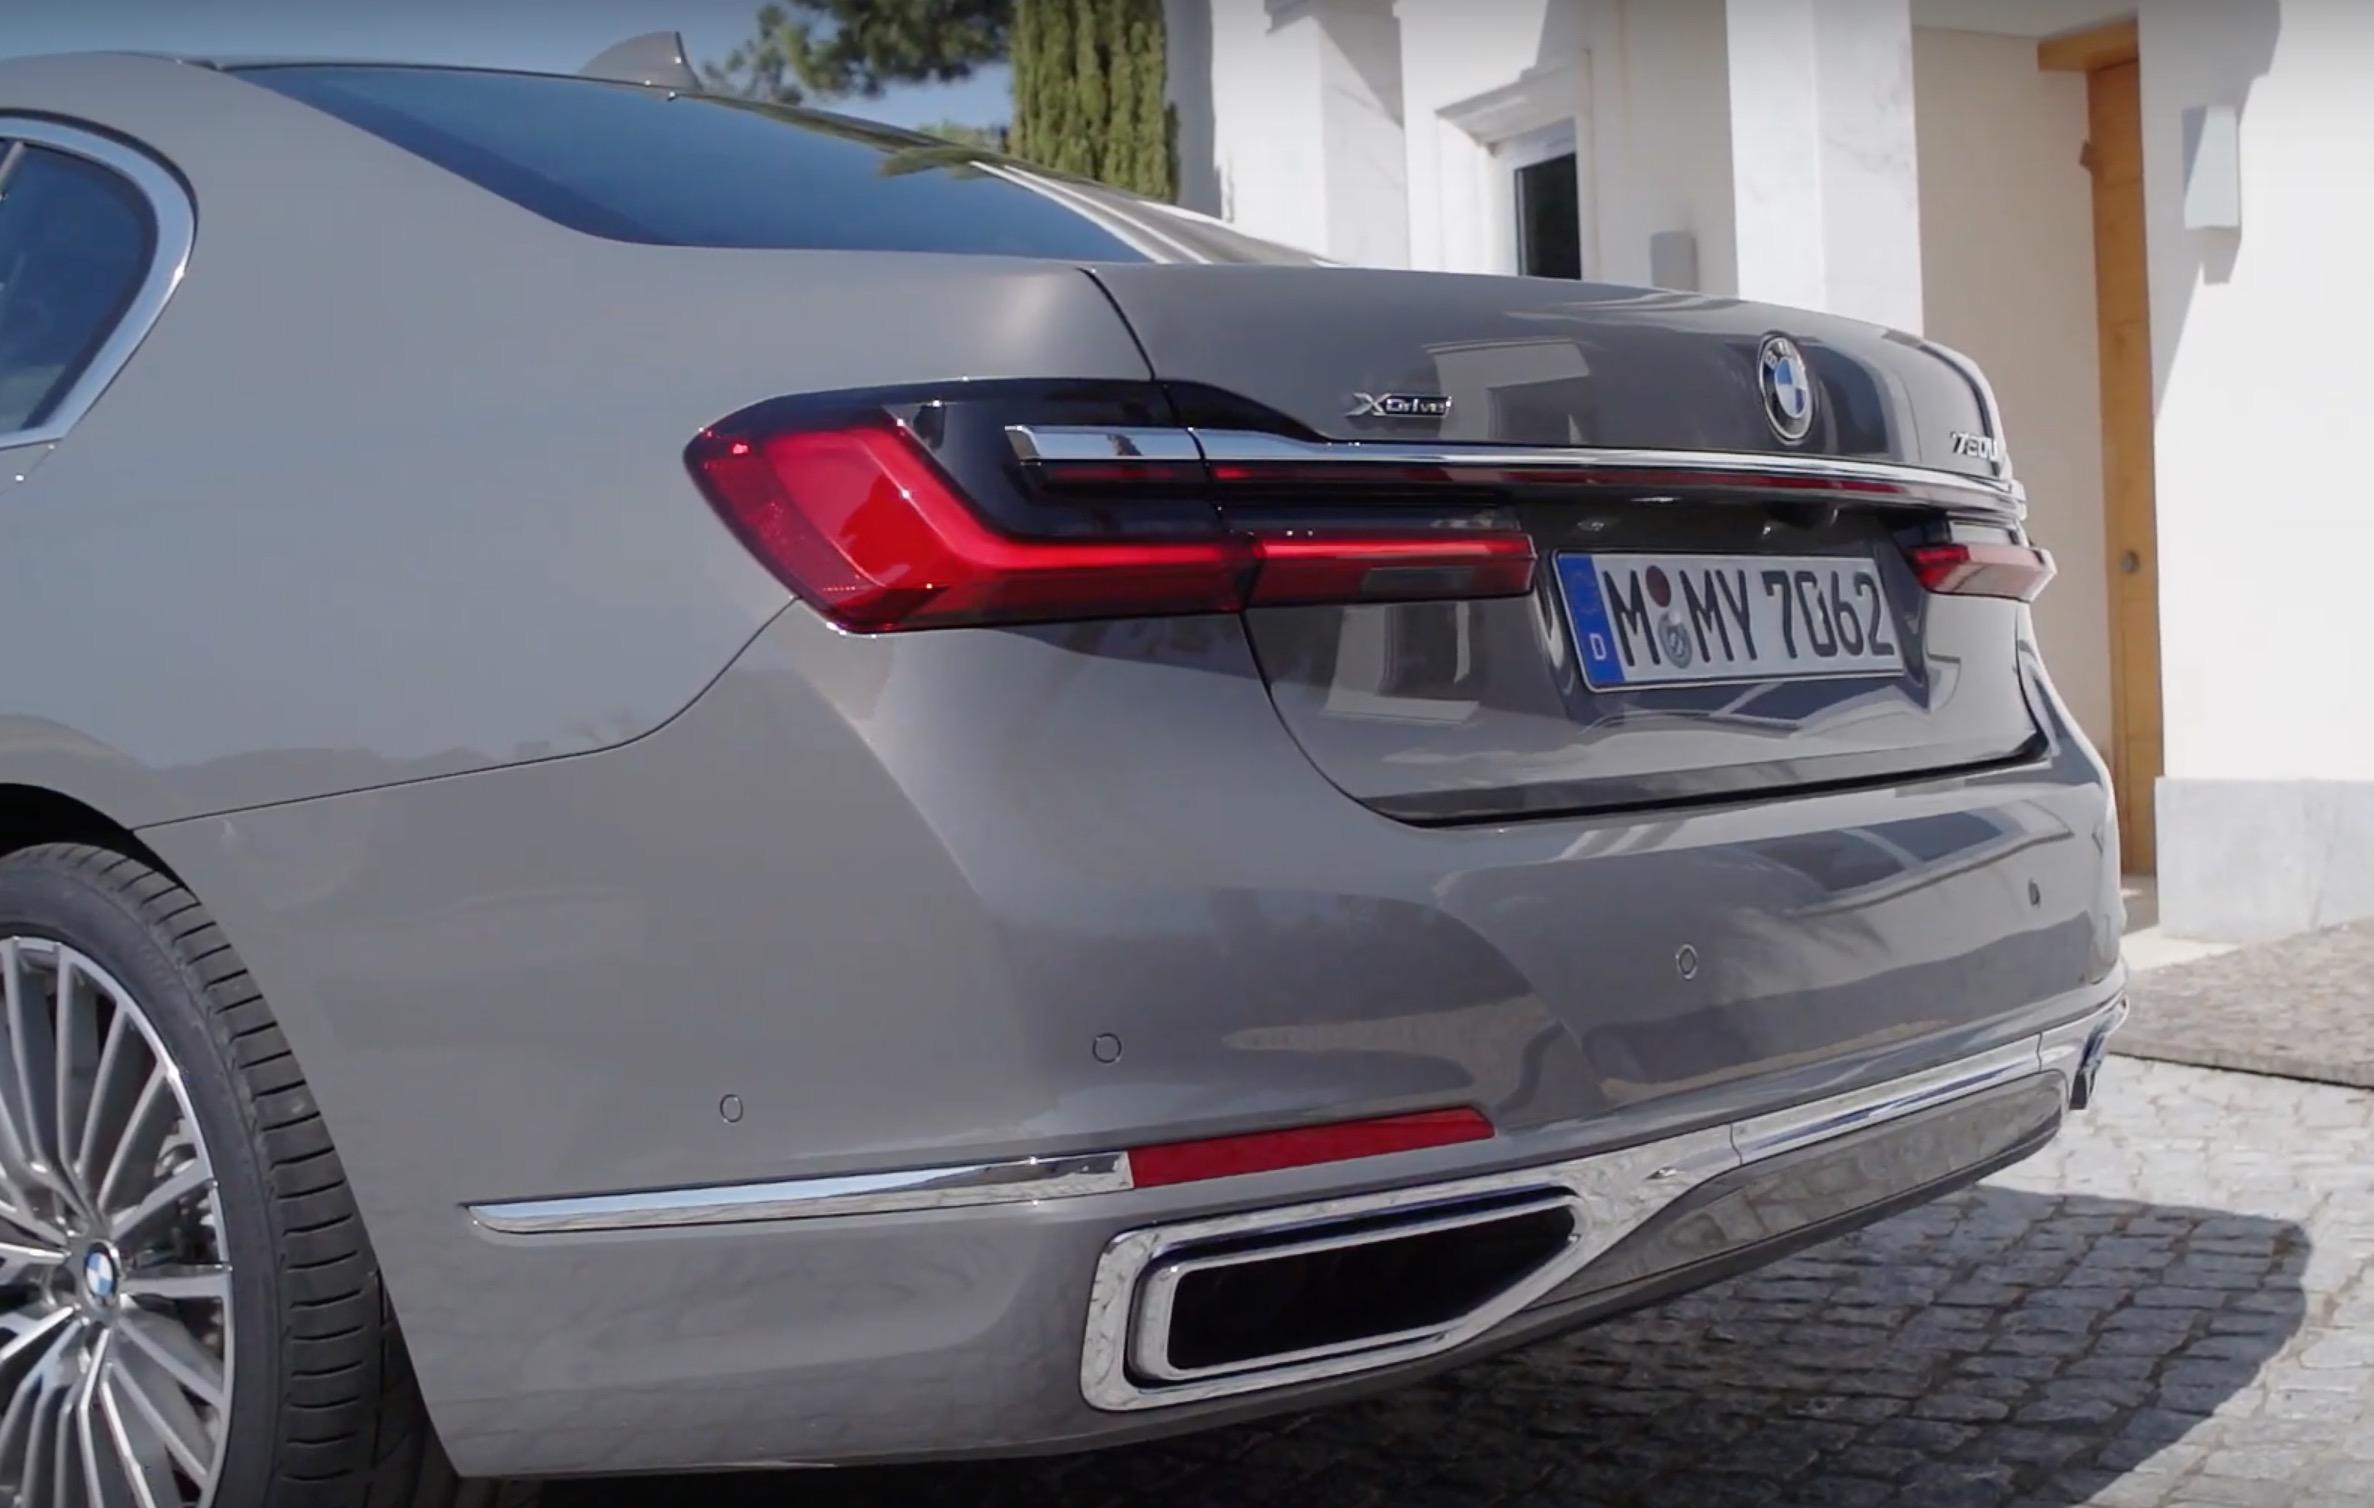 Bmw 7er Facelift Fahrbericht 750i V8 Vs 745e Plugin Hybrid Autogefühl